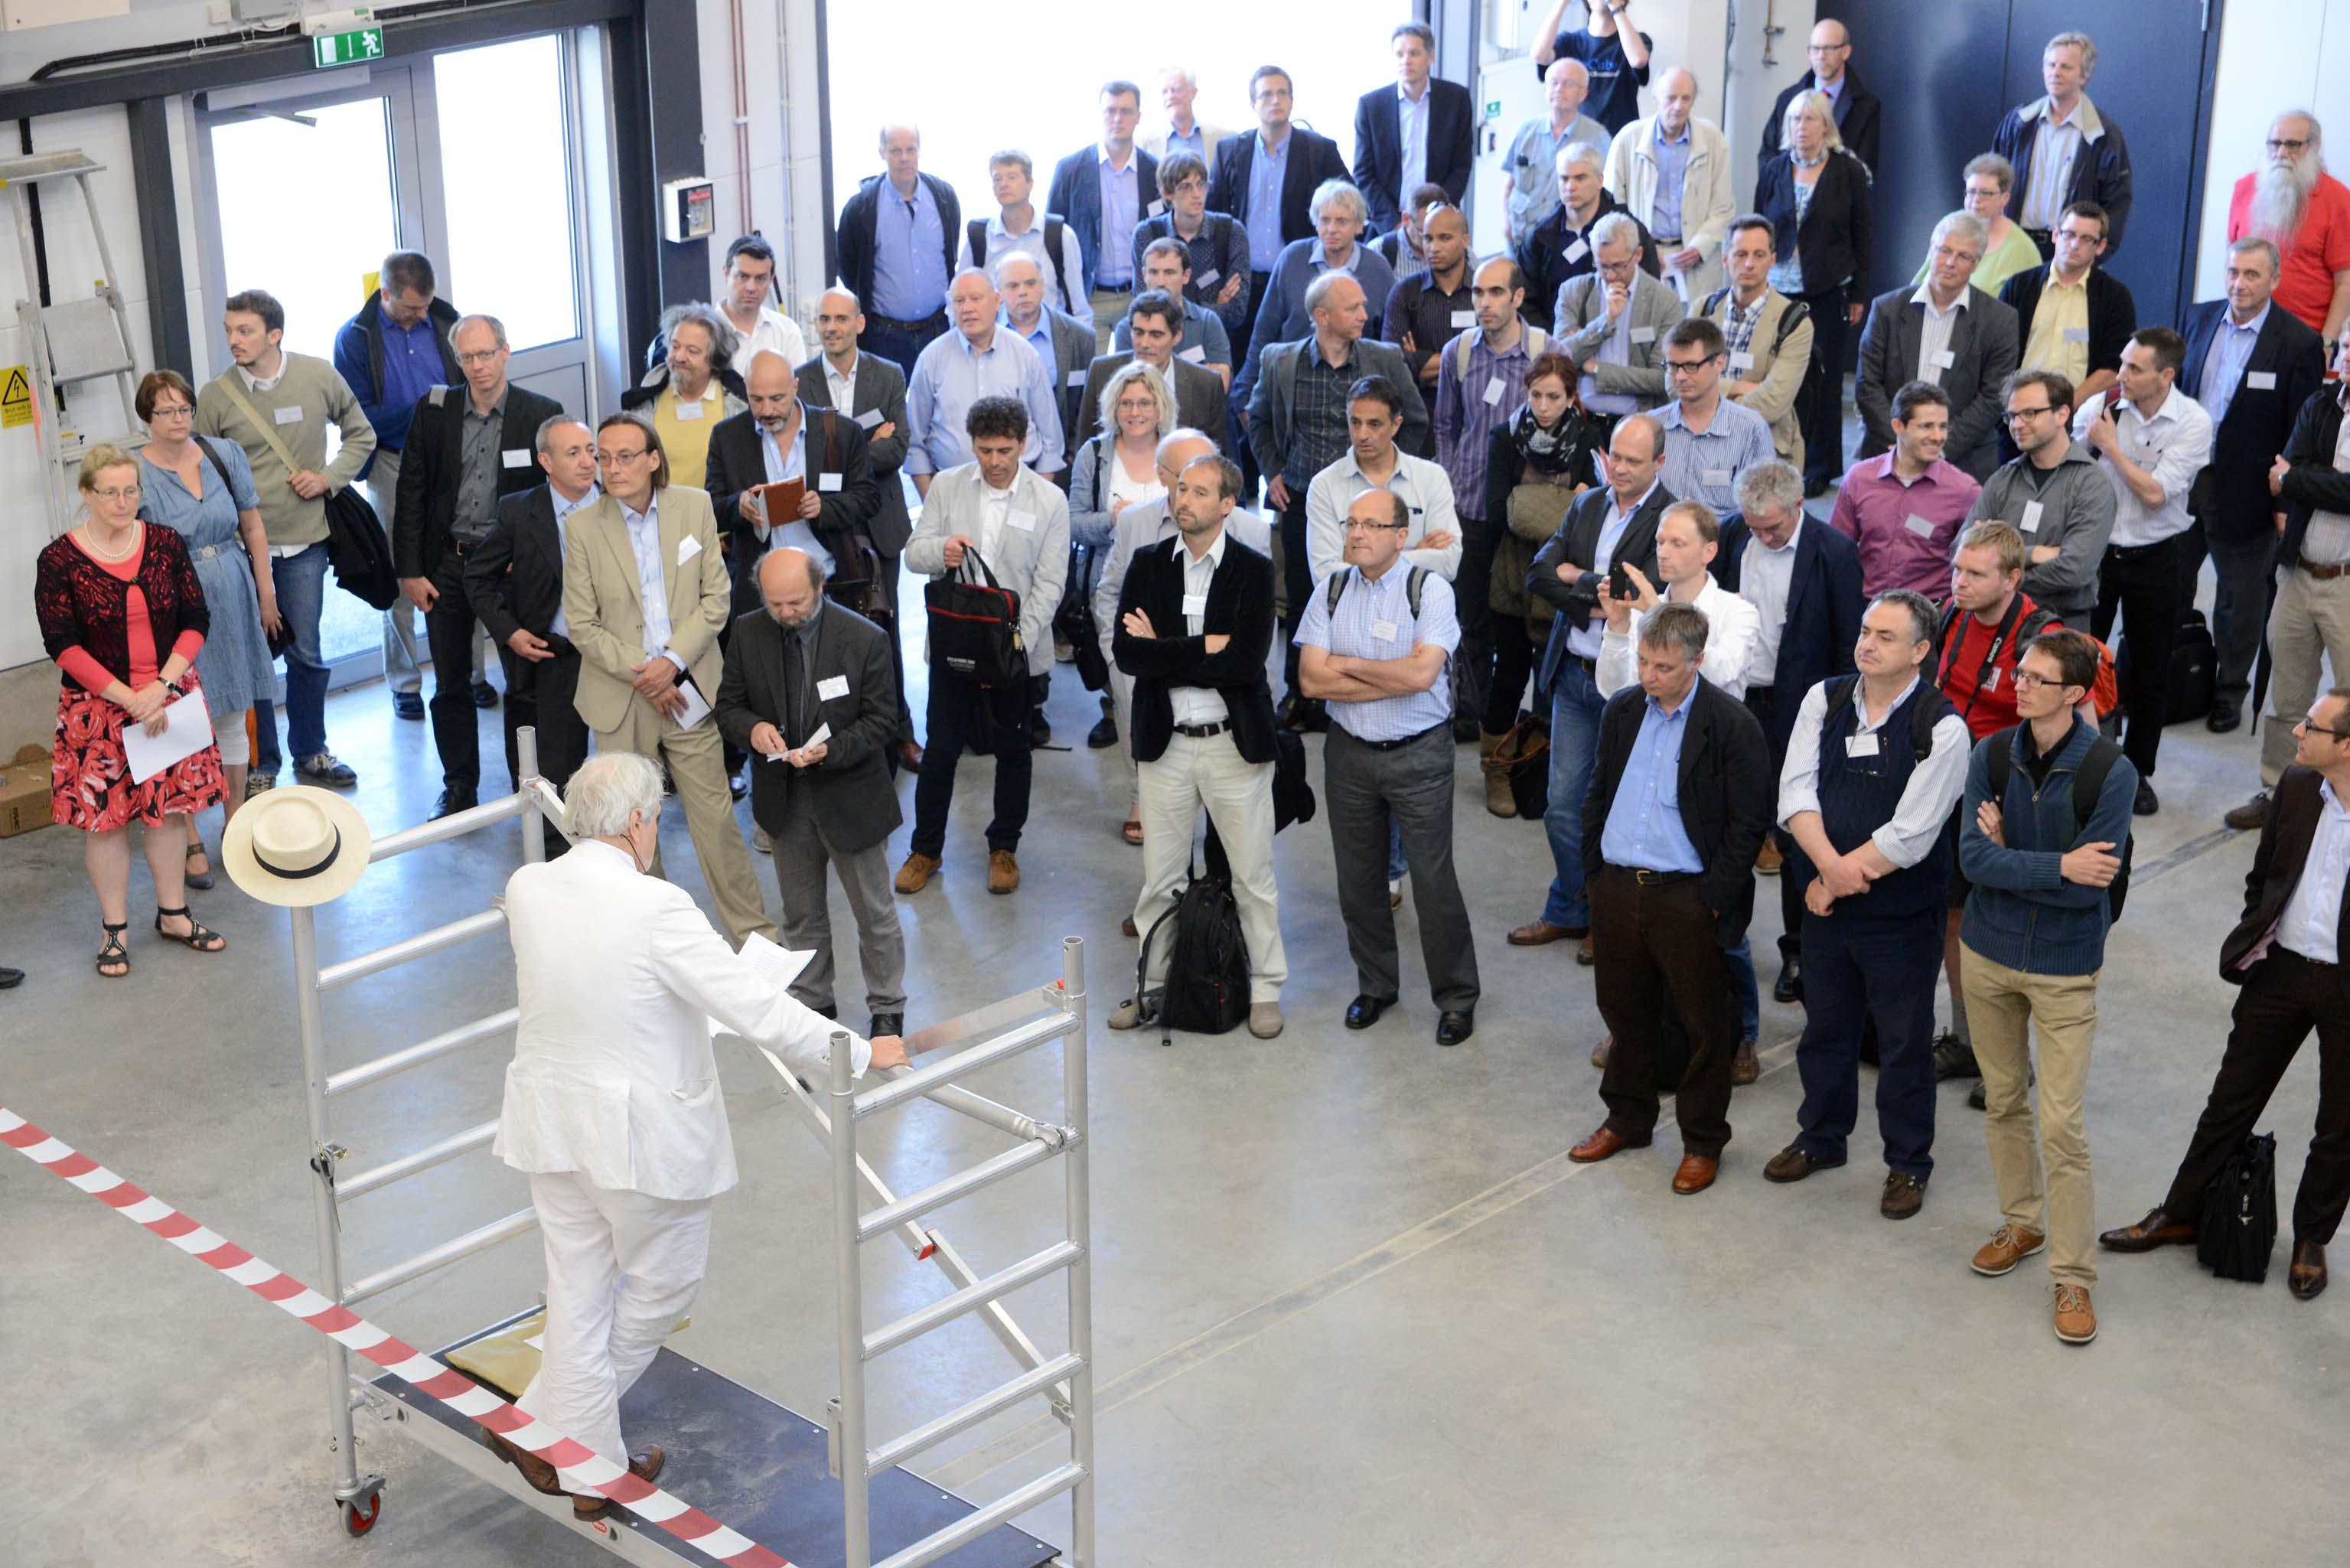 17-19 June 2013: TIARA workshop on RF power generation in Uppsala